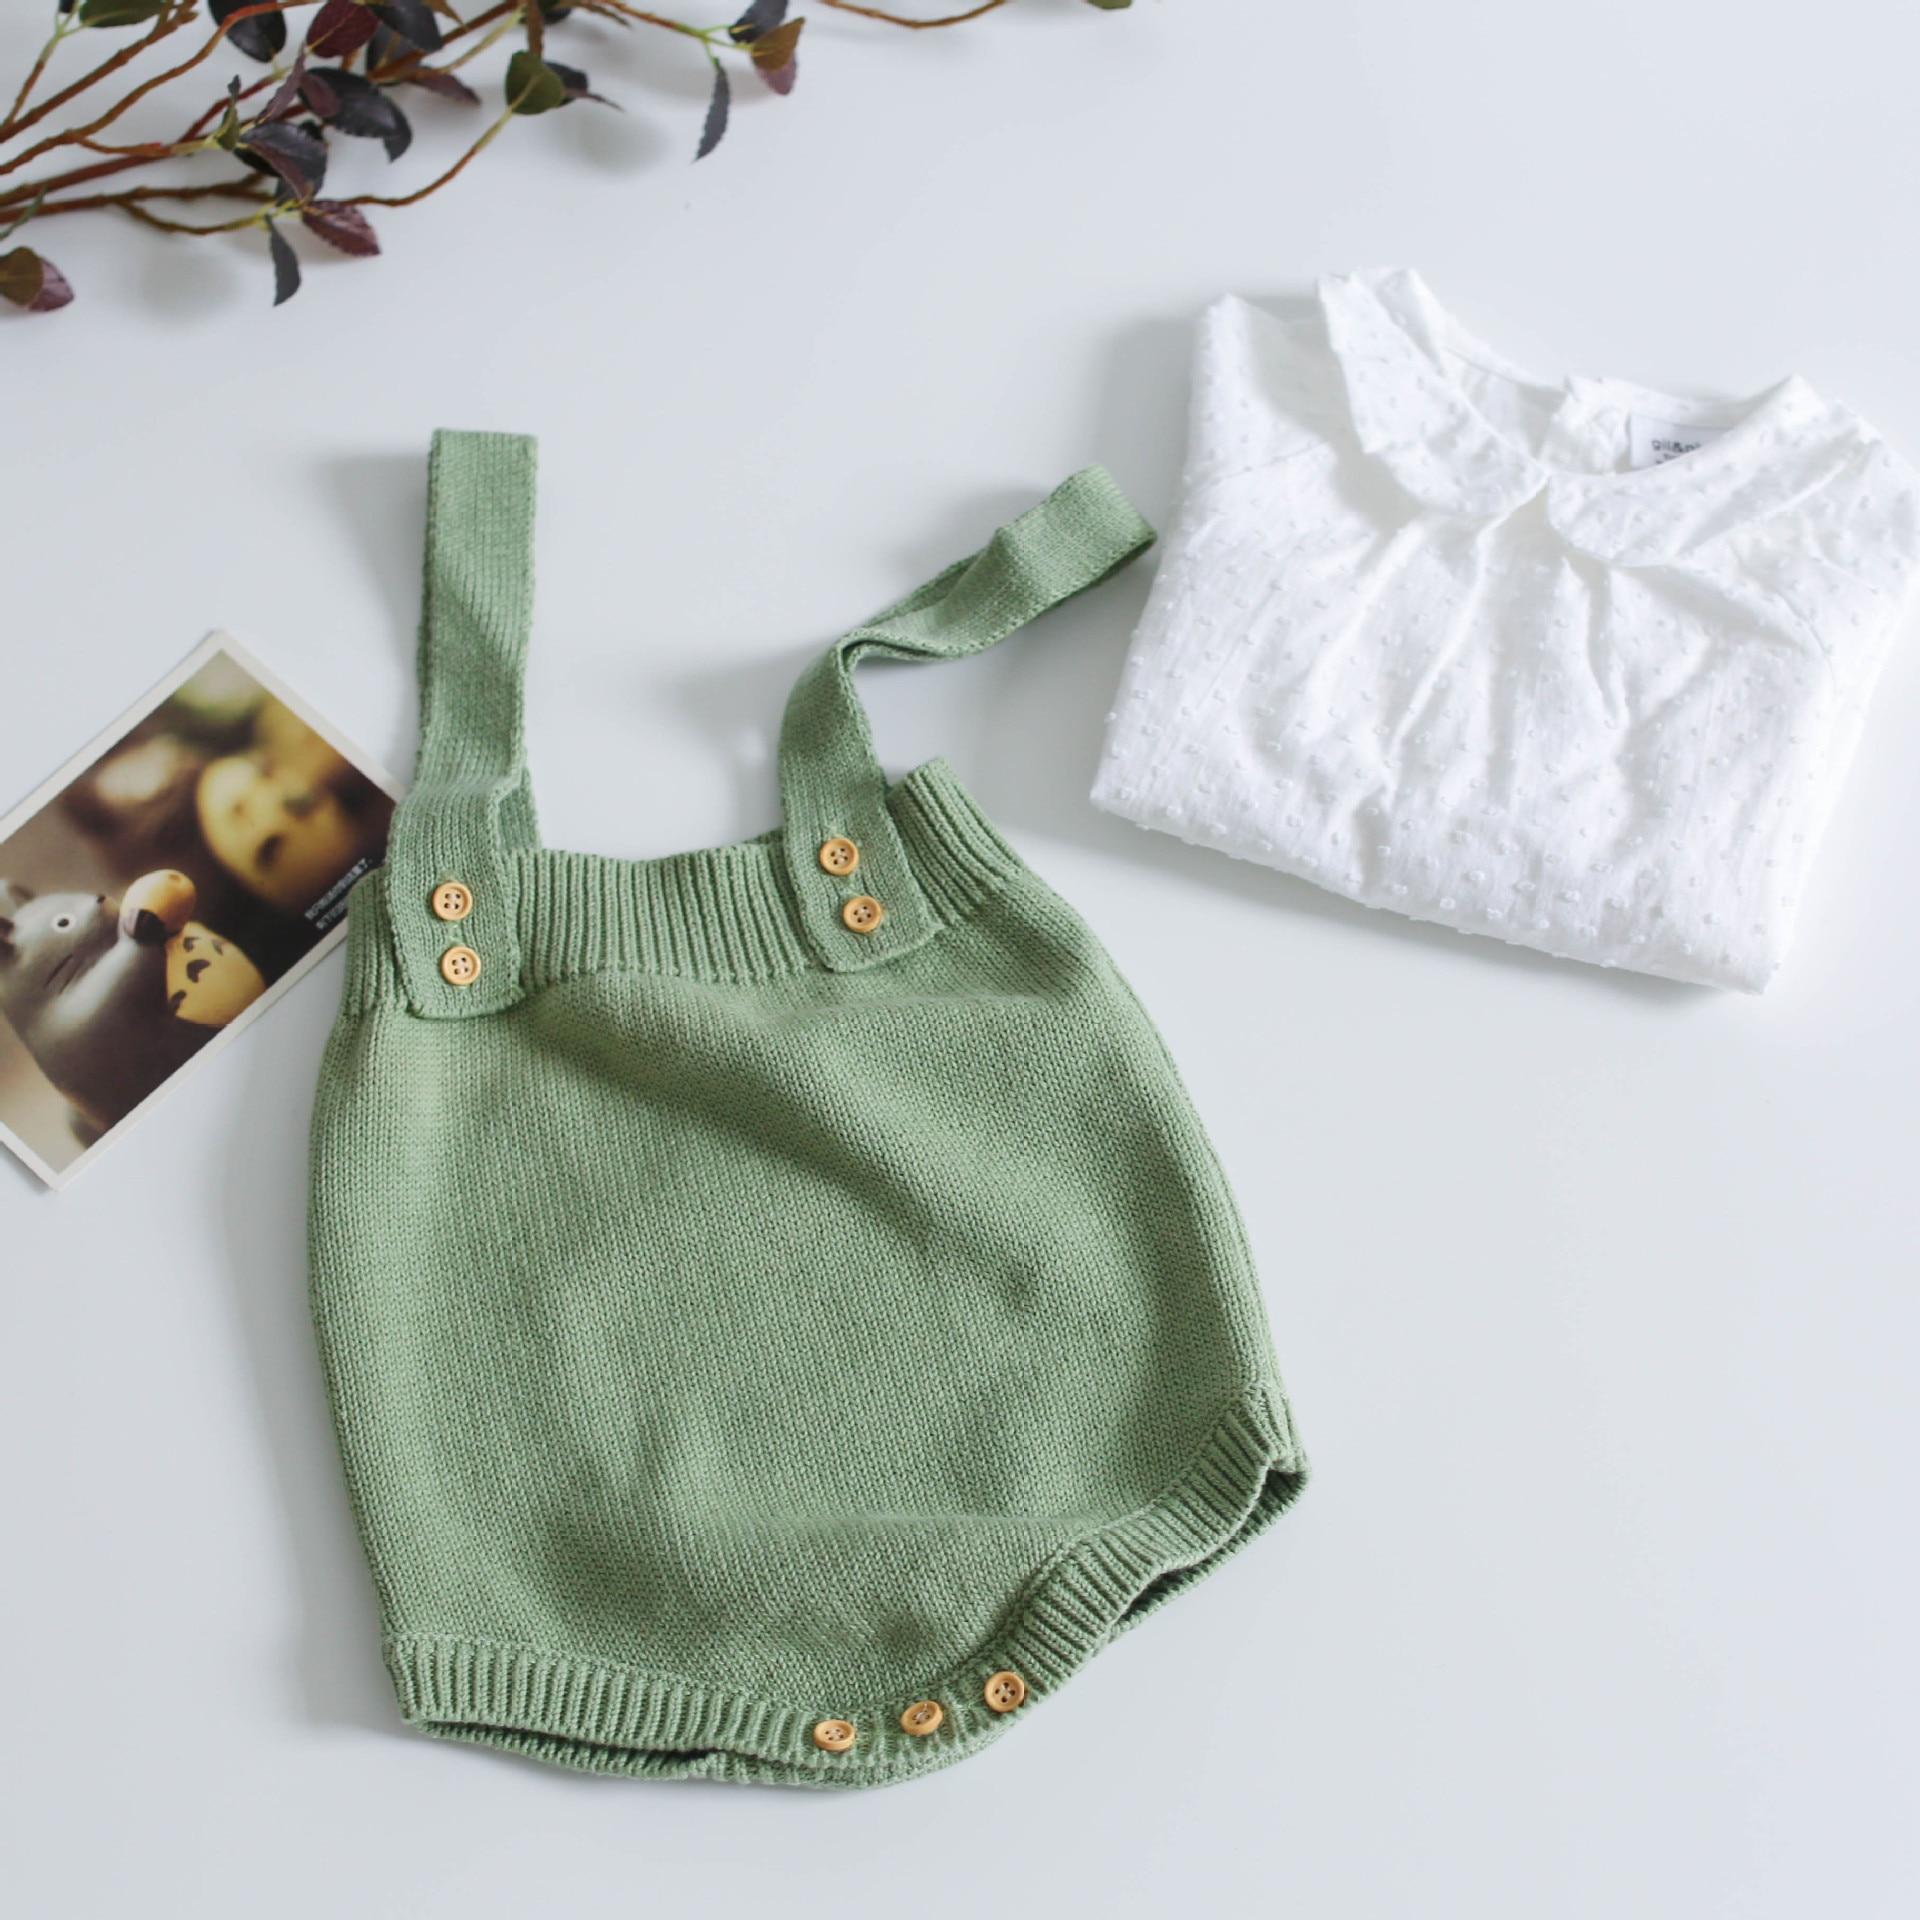 H46f3b3ec3a7543d8bda1f224fb9b7557T Baby Knitting Rompers Cute Overalls Newborn Baby Girls Boys Clothes Infantil Baby Girl Boy Sleeveless Romper Jumpsuit 0-24m